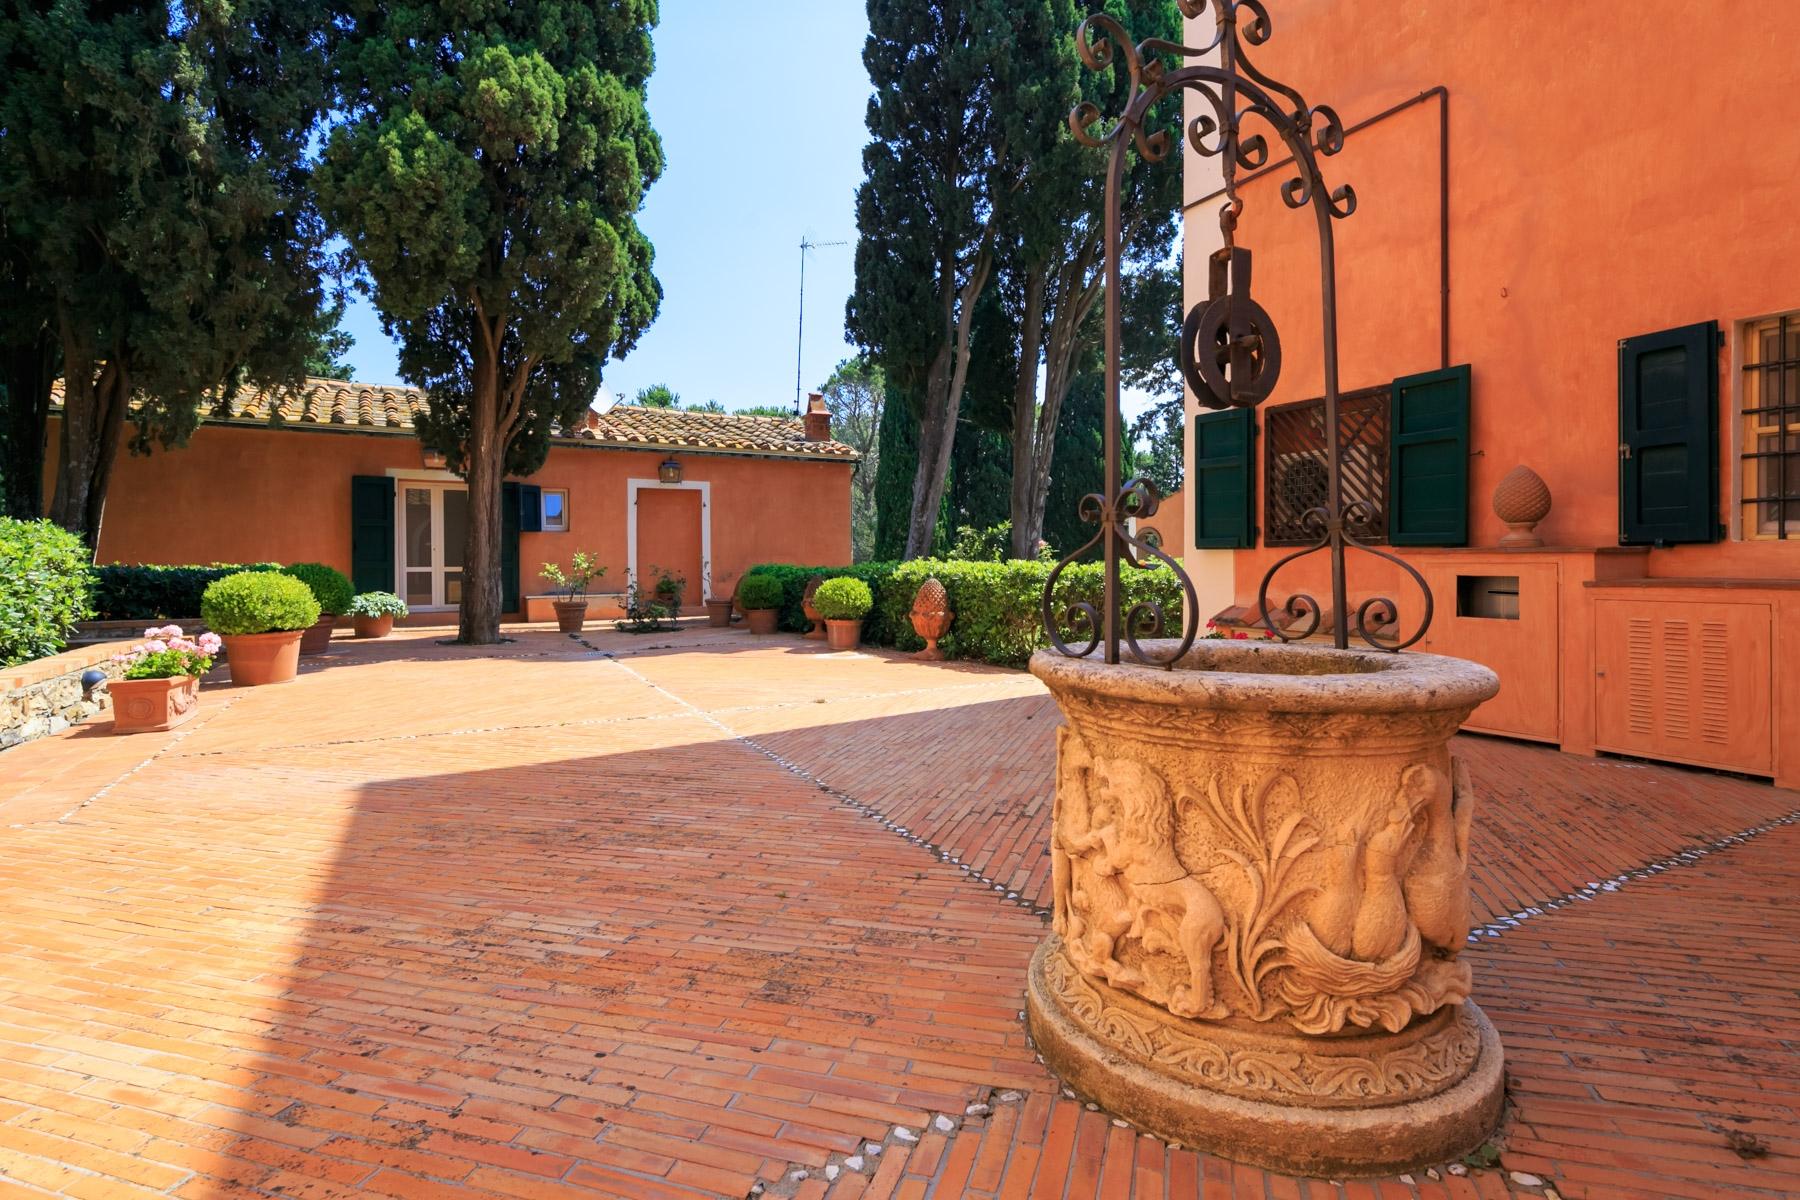 Villa in Vendita a Campiglia Marittima: 5 locali, 1100 mq - Foto 3